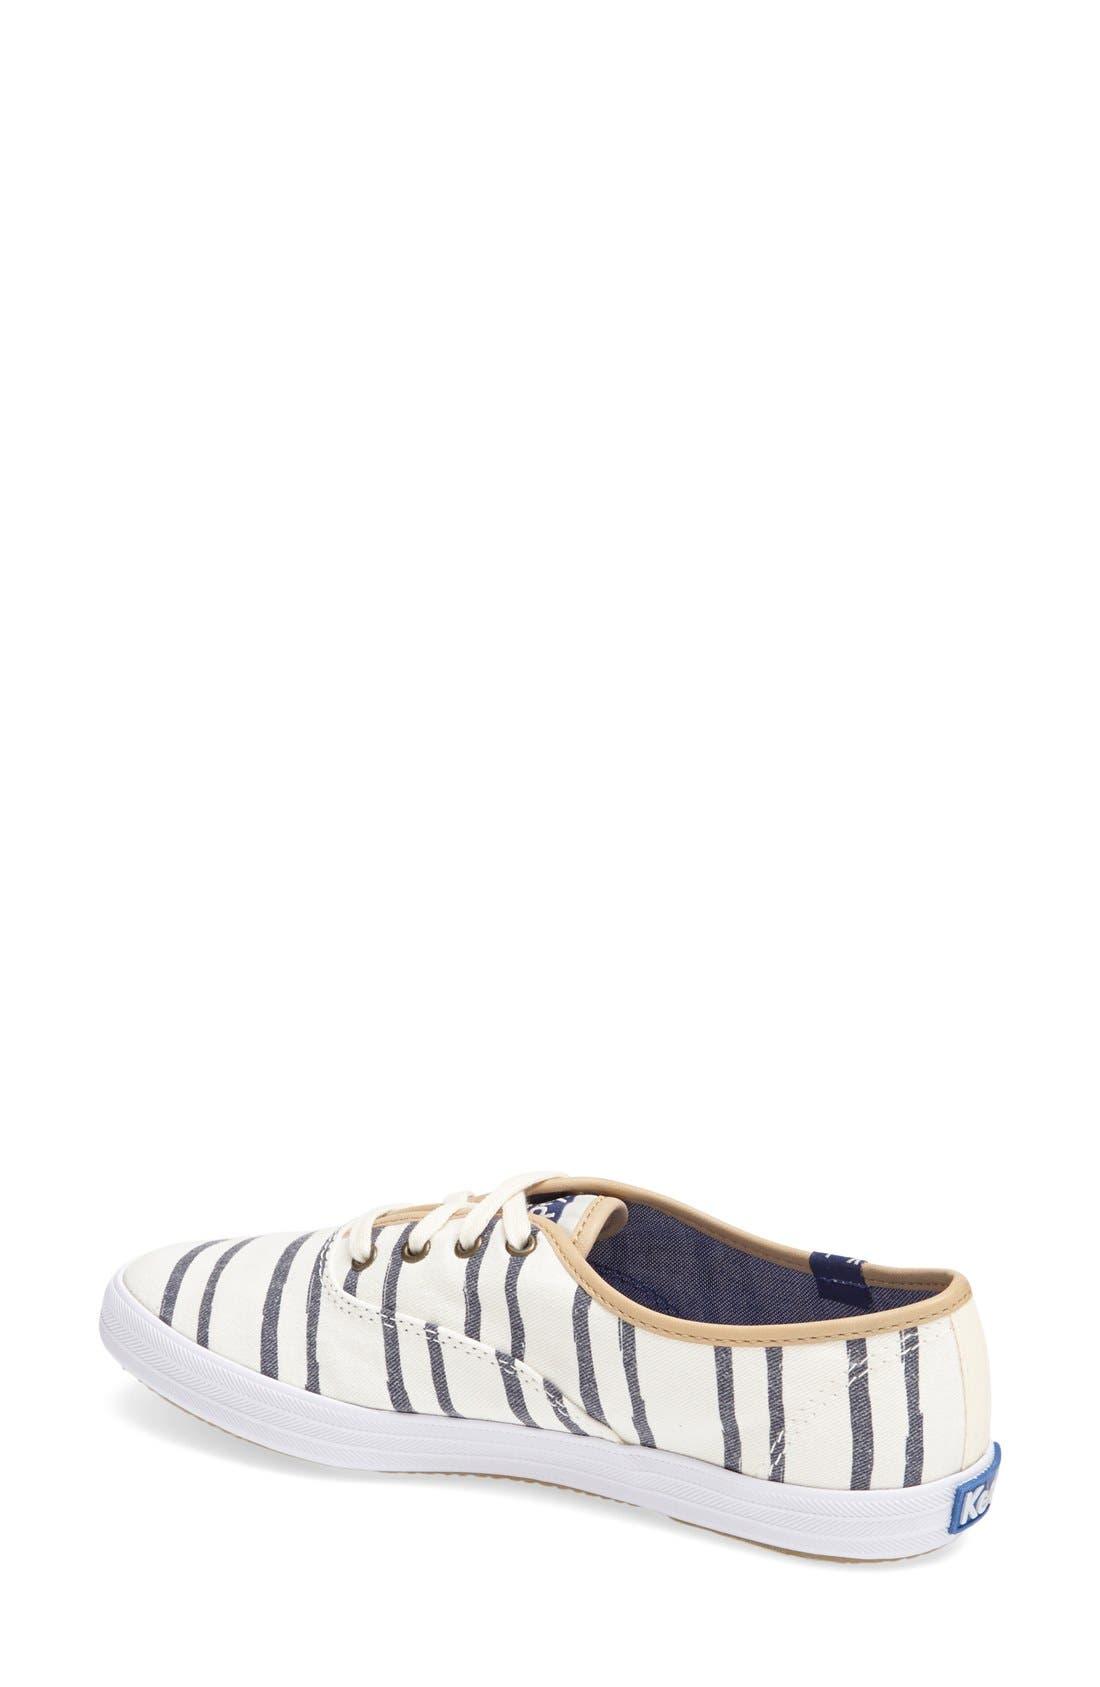 Alternate Image 4  - Keds® 'Champion - Washed Beach Stripe' Sneaker (Women)